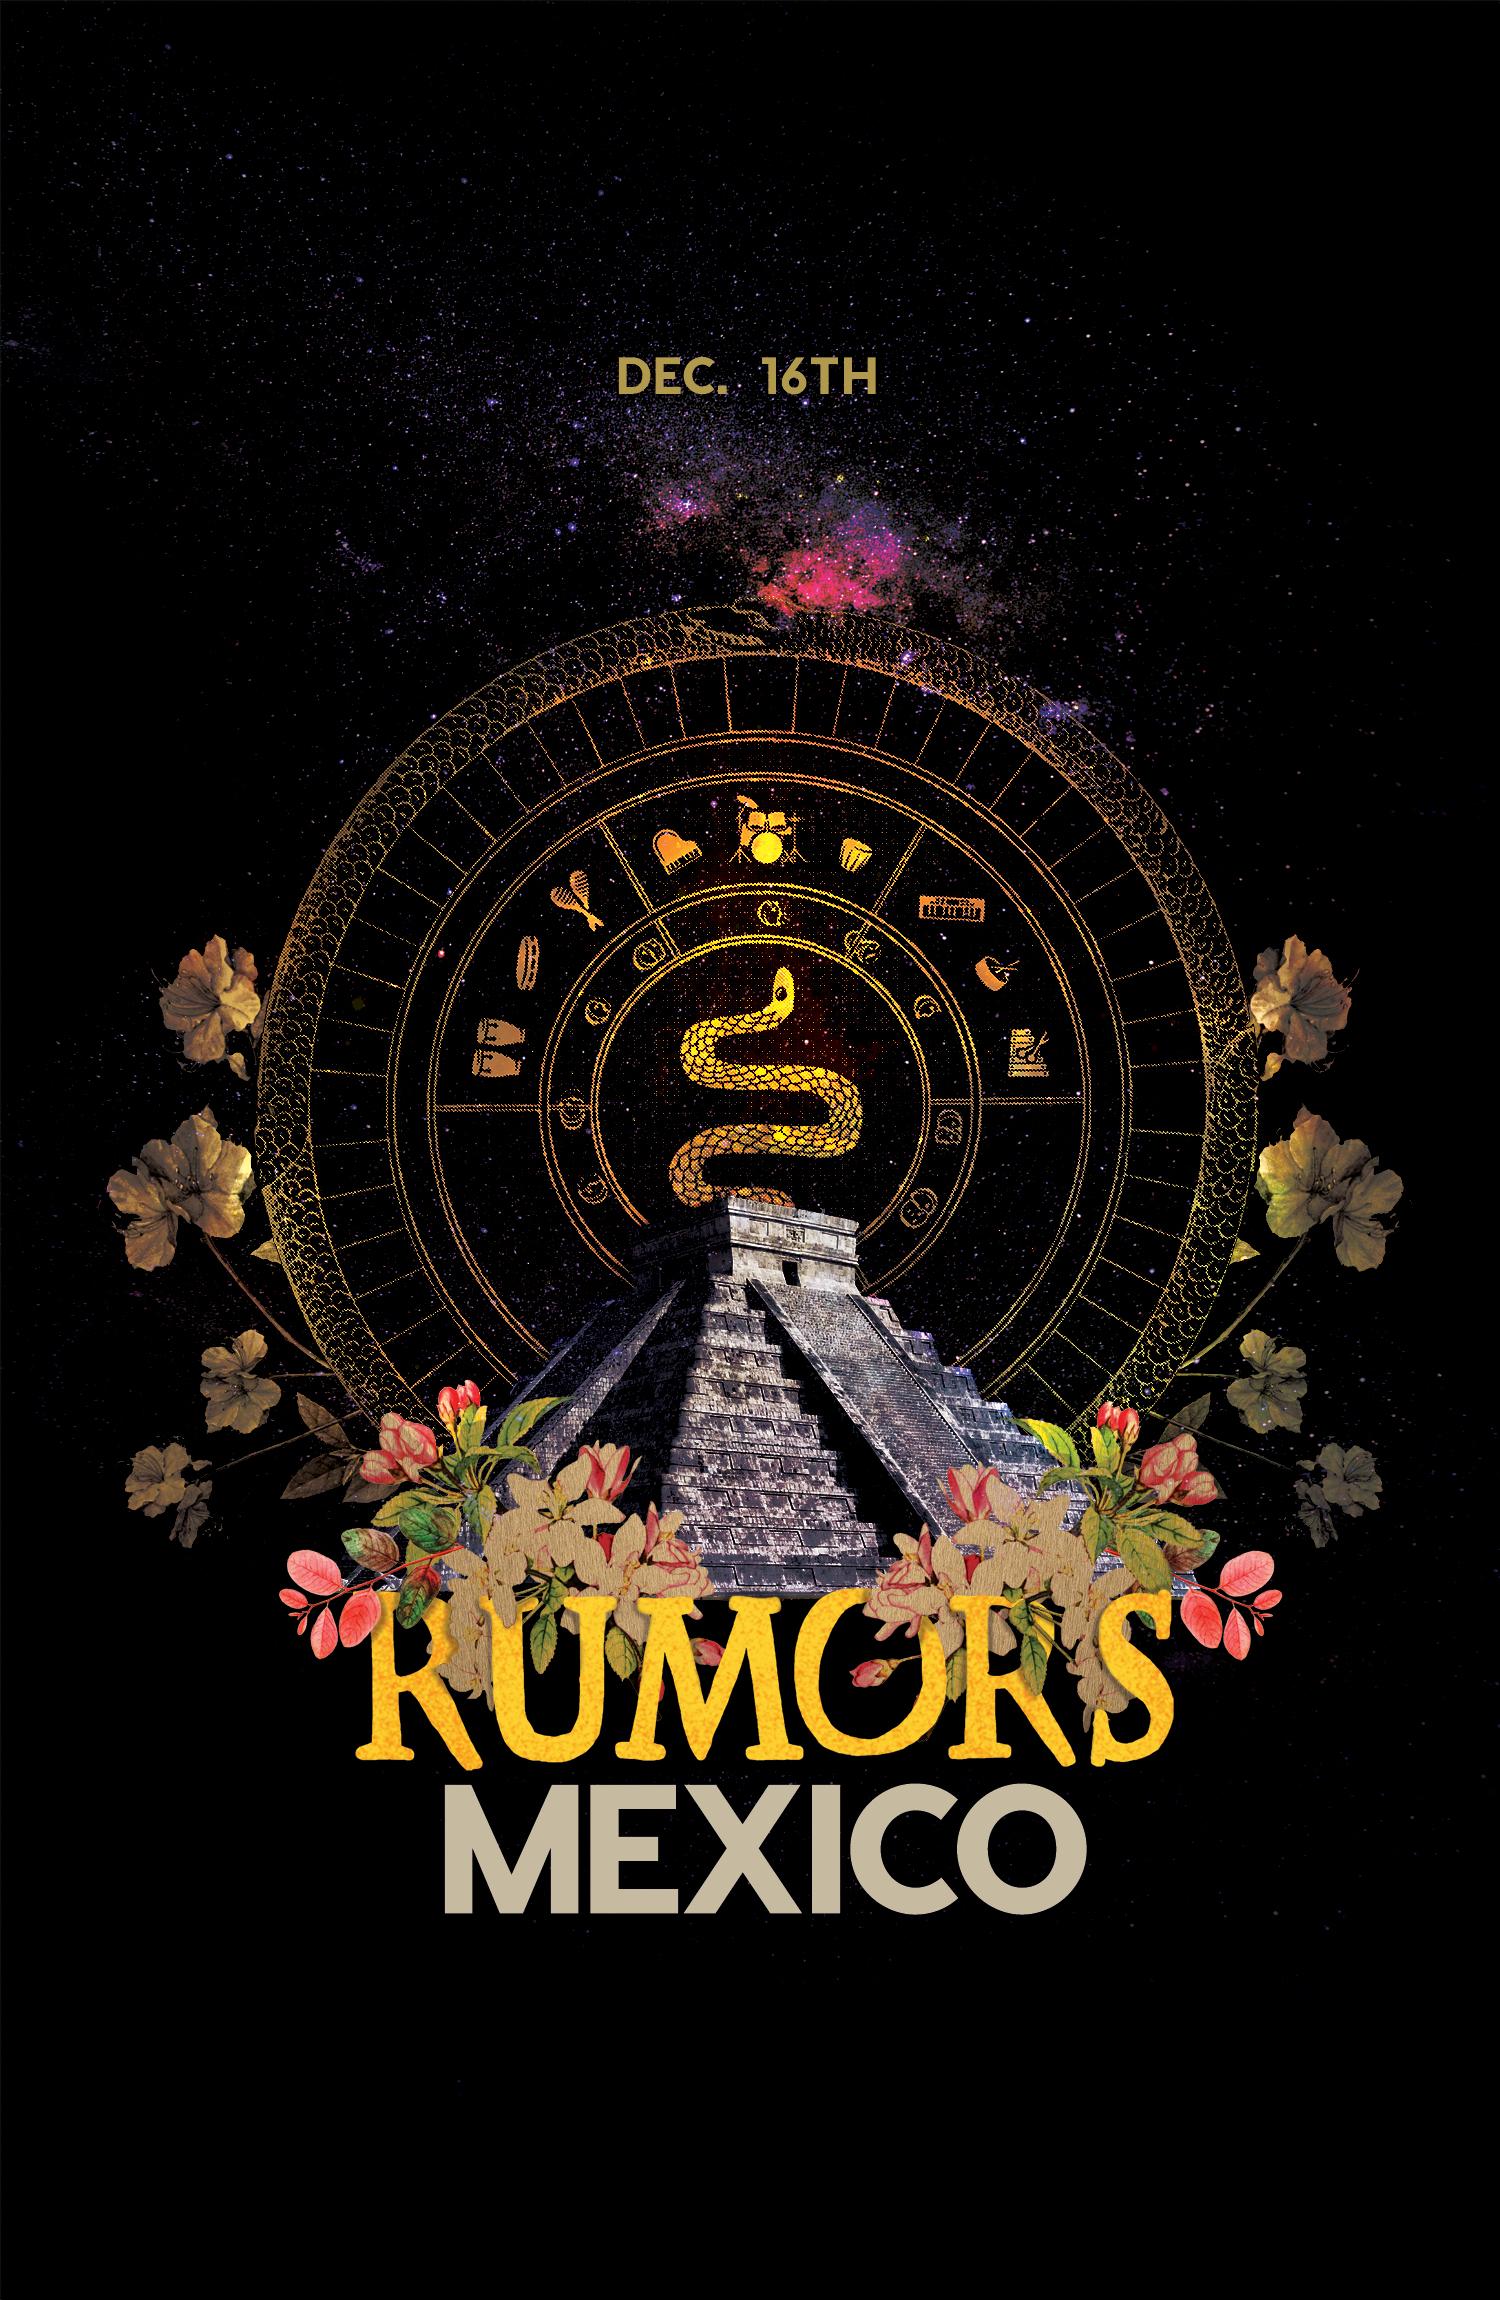 Rumors-MEXICO-11x17.jpg